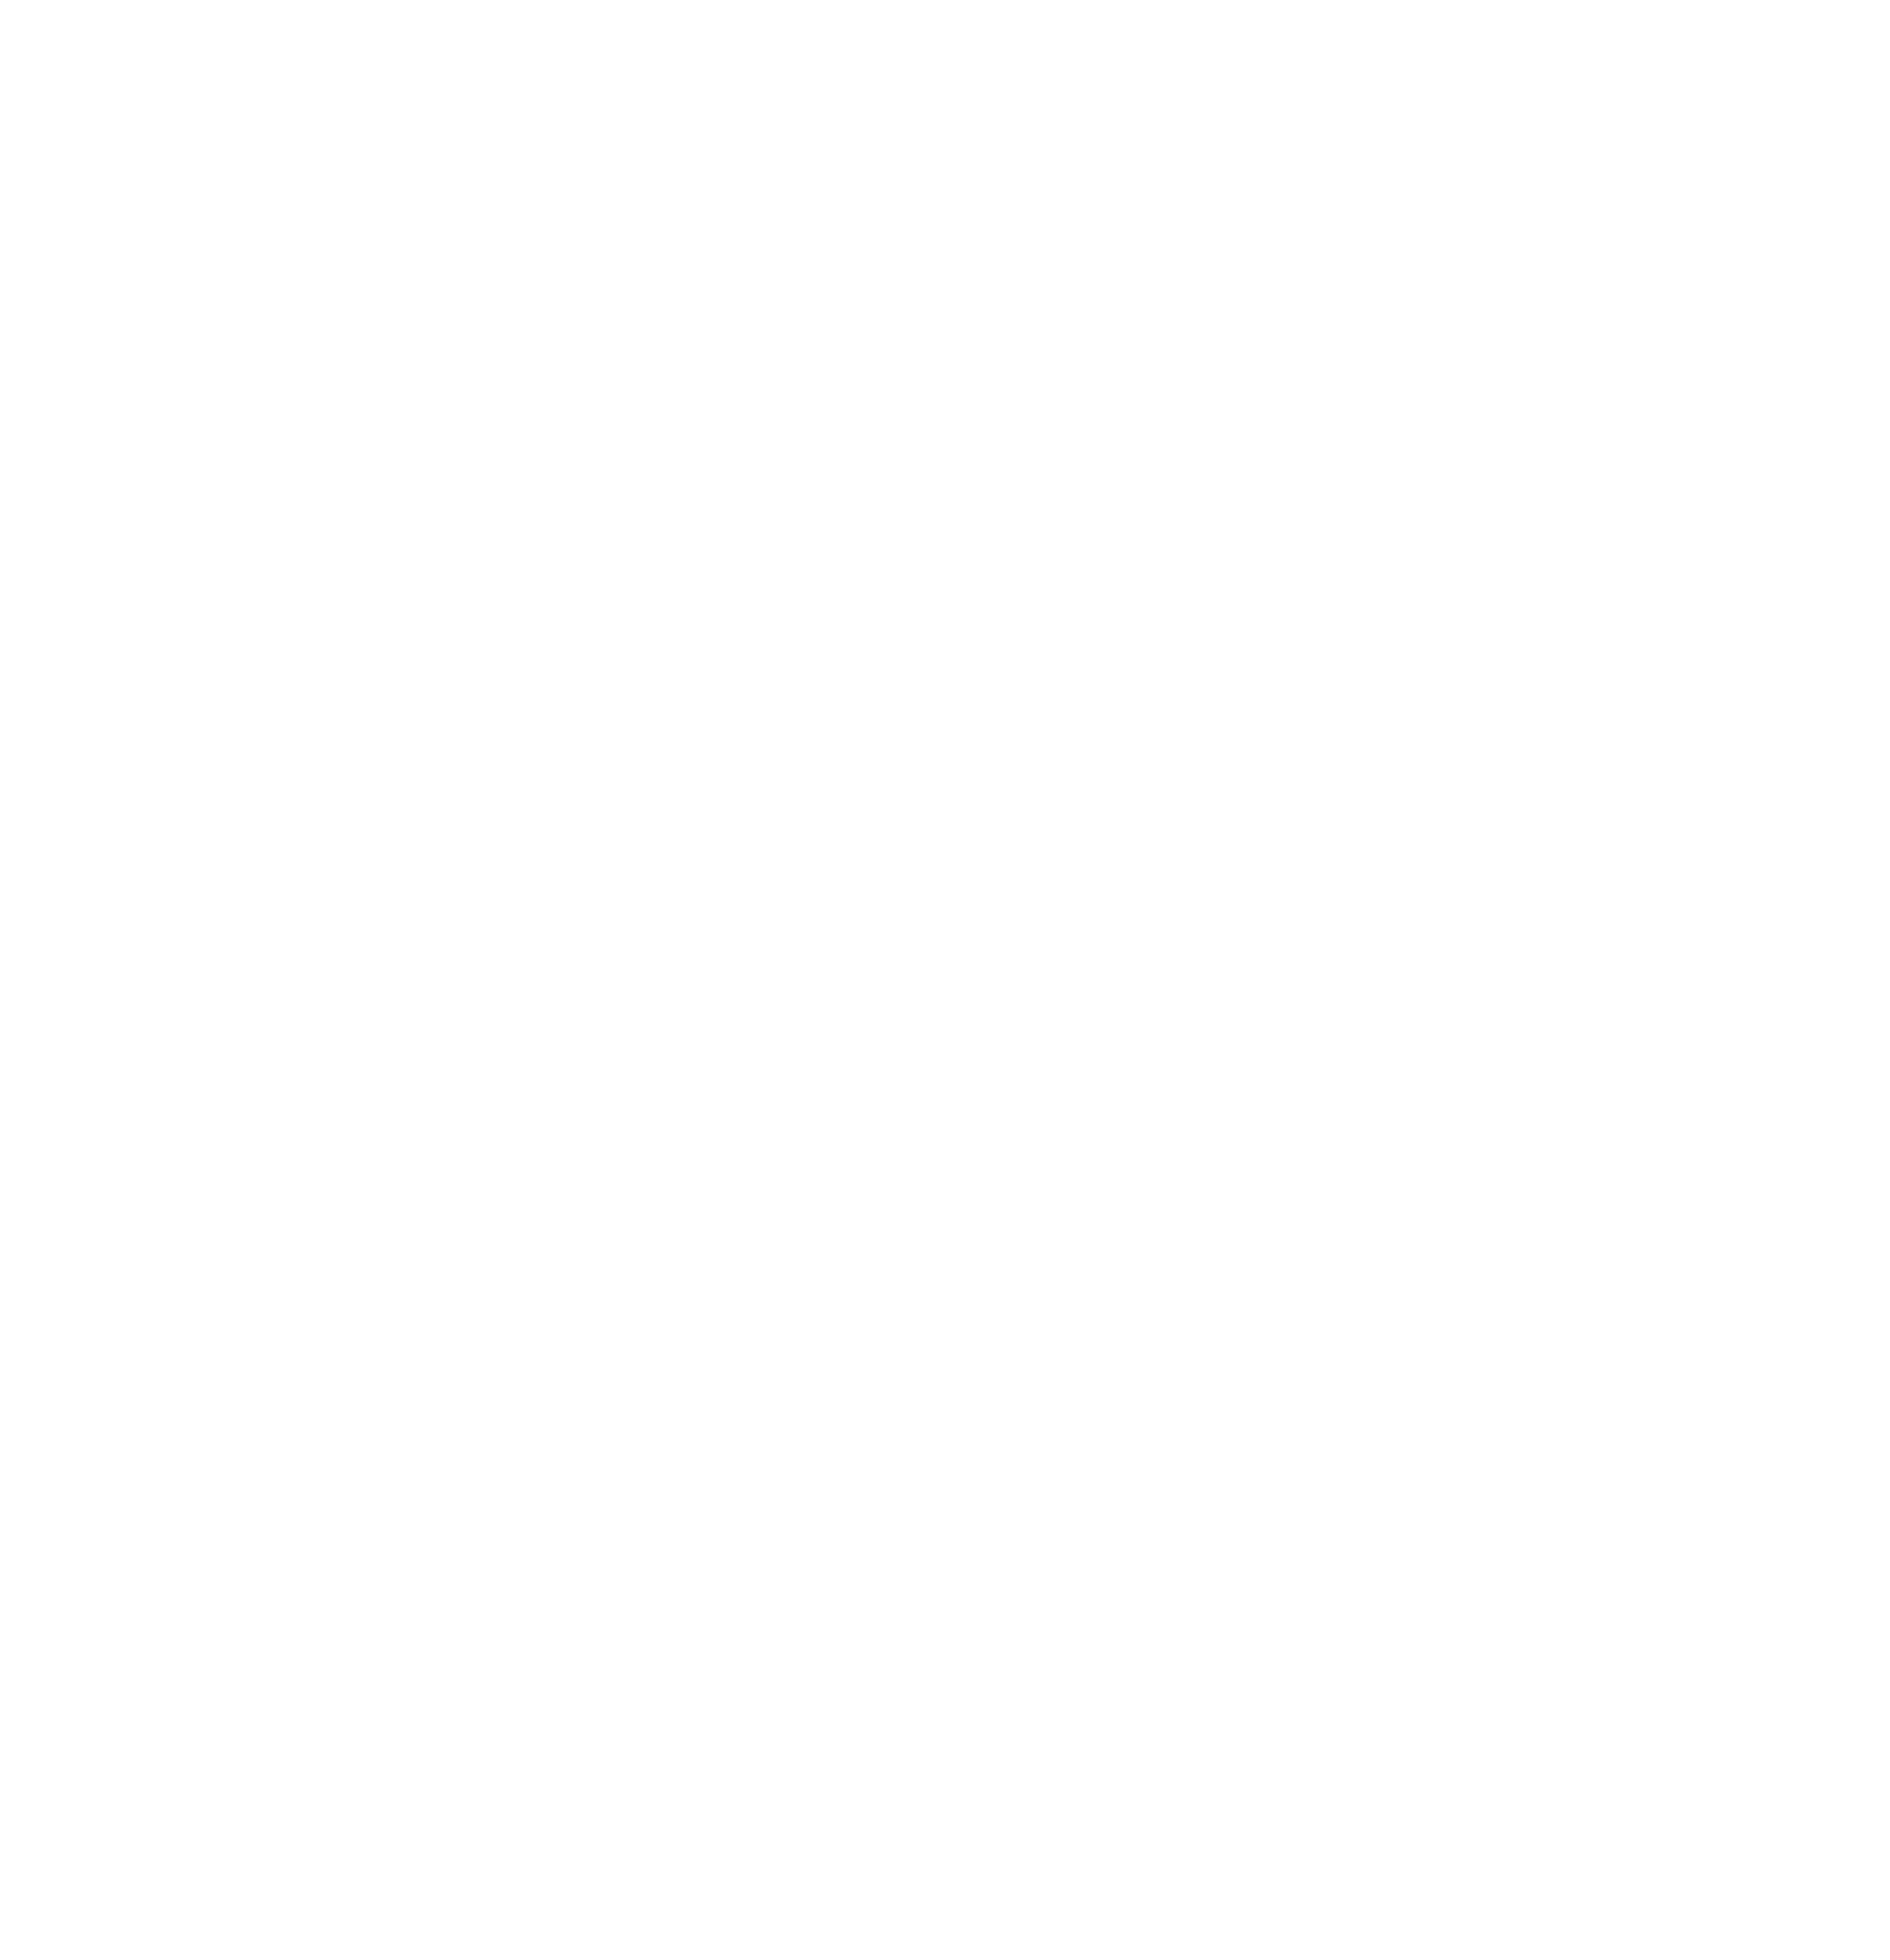 FlowForma - We are Inventive